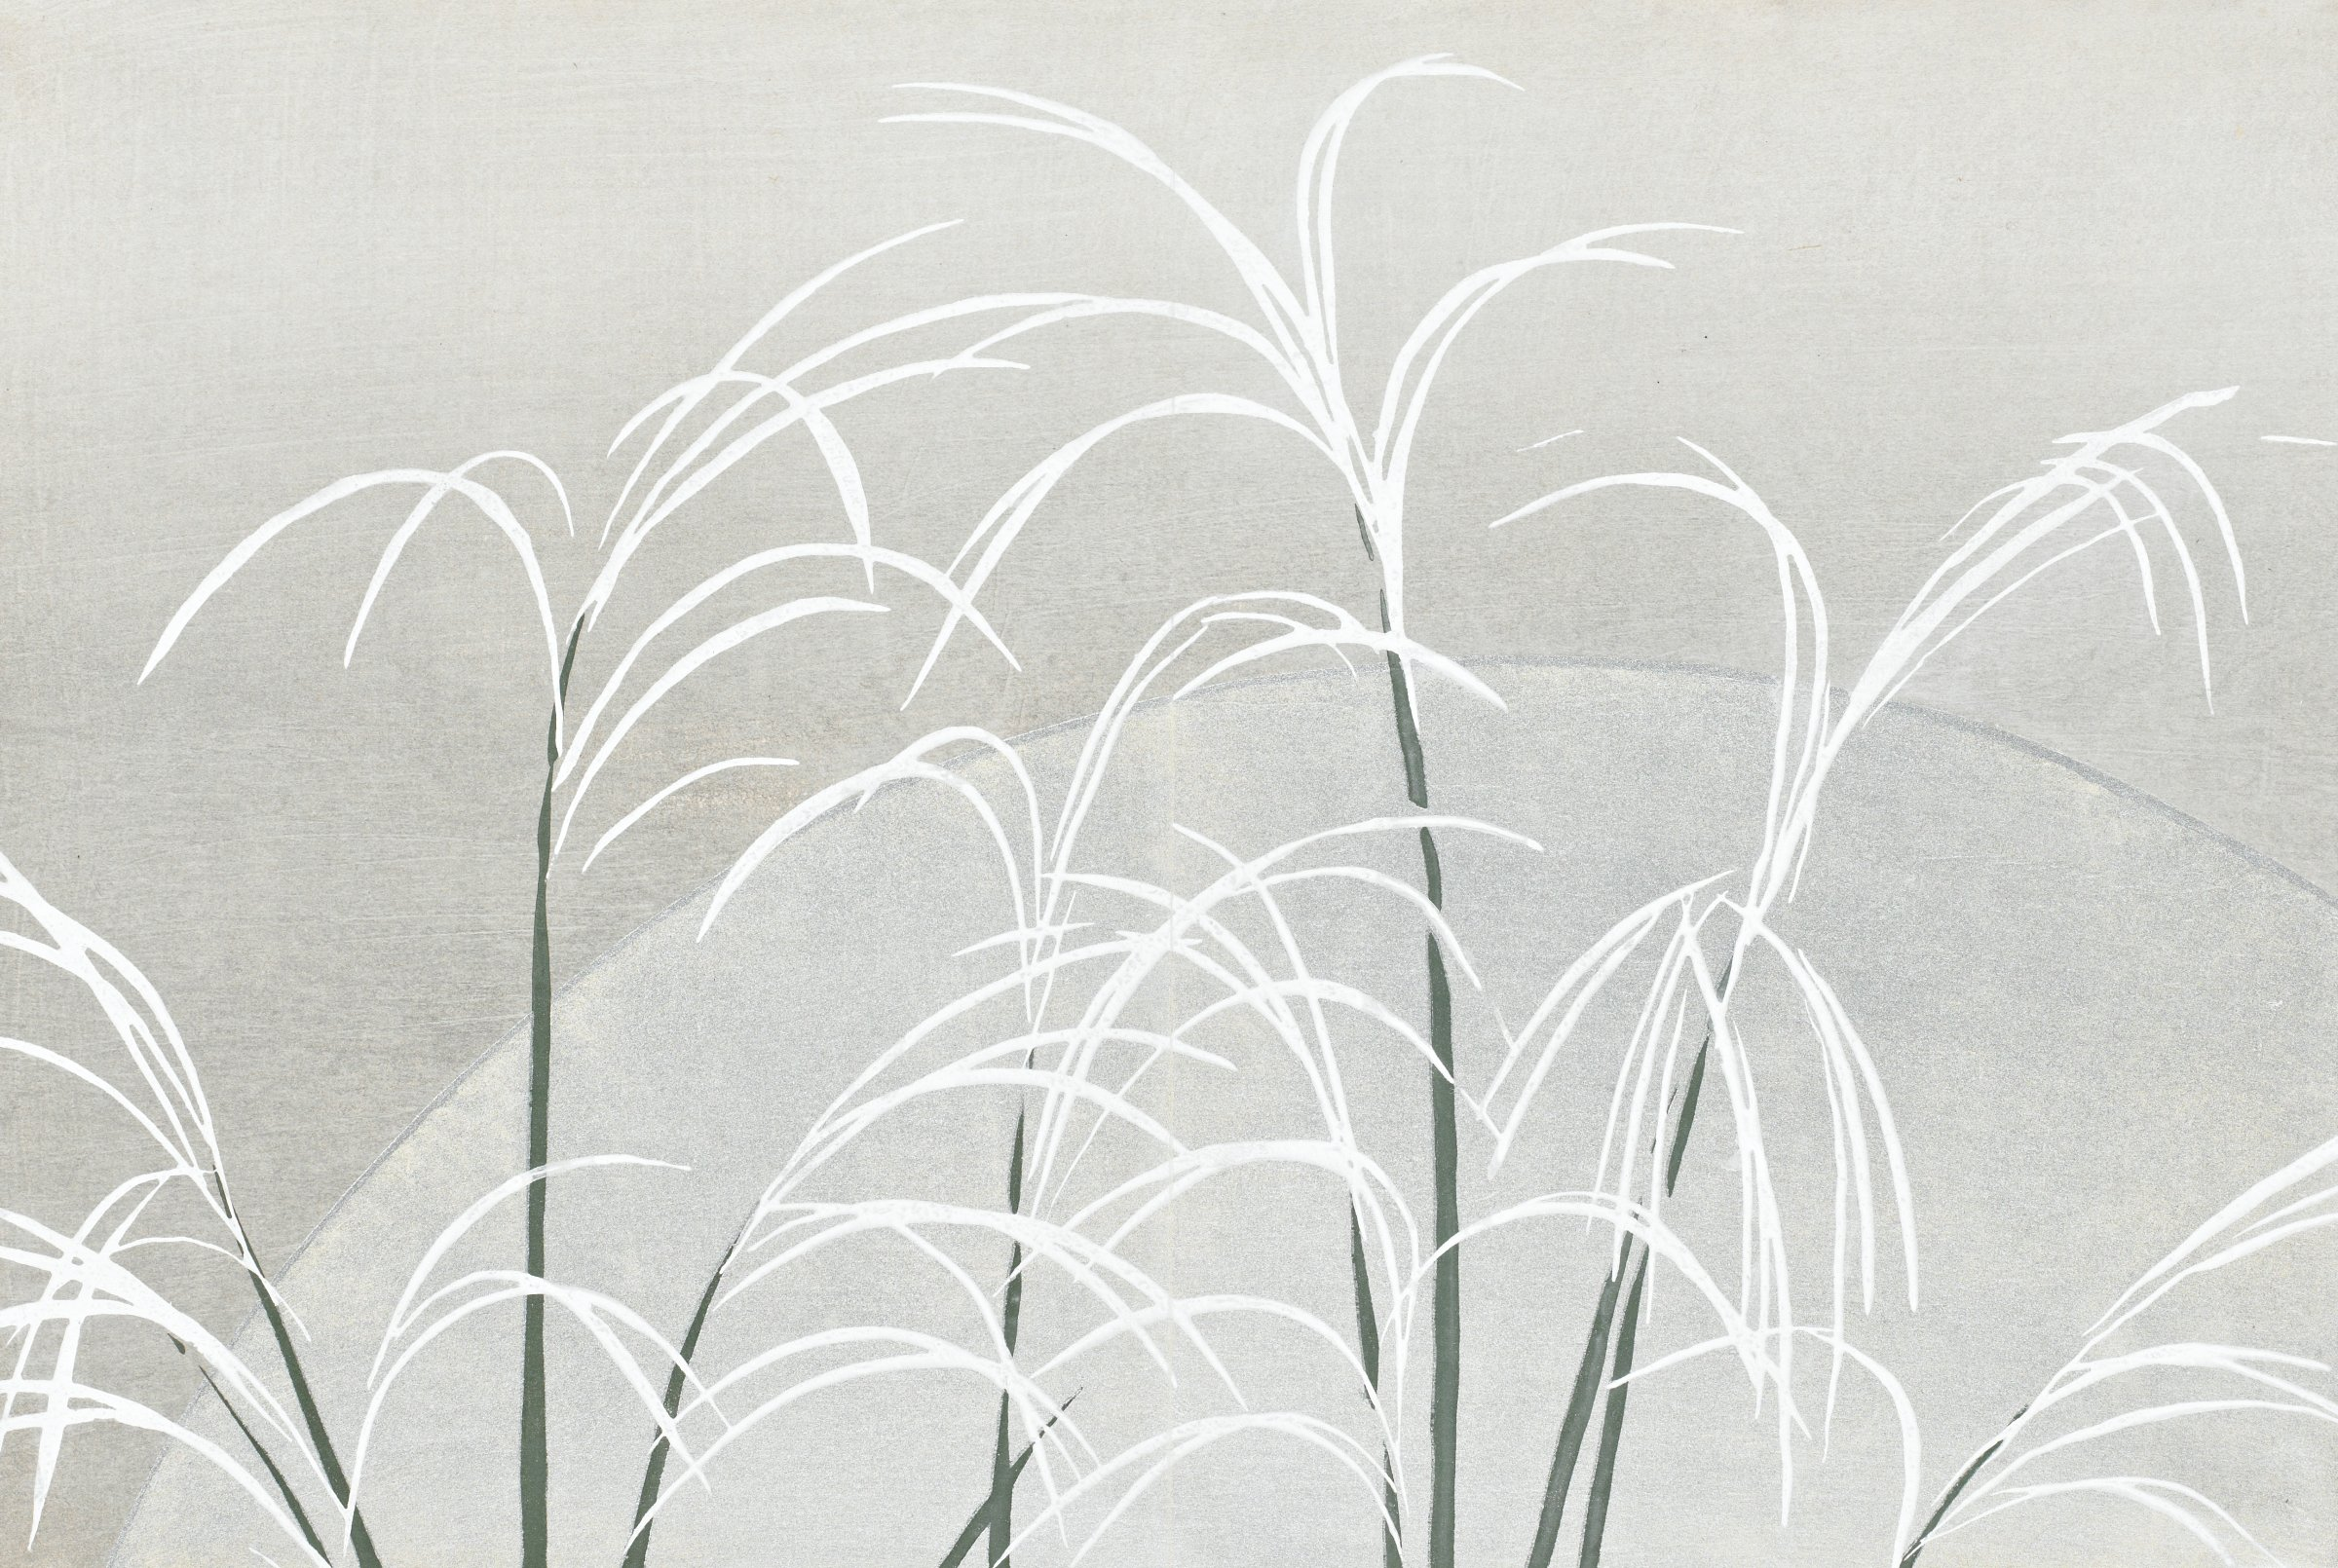 Obana ni Tsuki (Susuki Grasses and the Autumn Moon), from Momoyogusa (A World of Things), Volume 2, Kamisaka Sekka, ink and color on paper